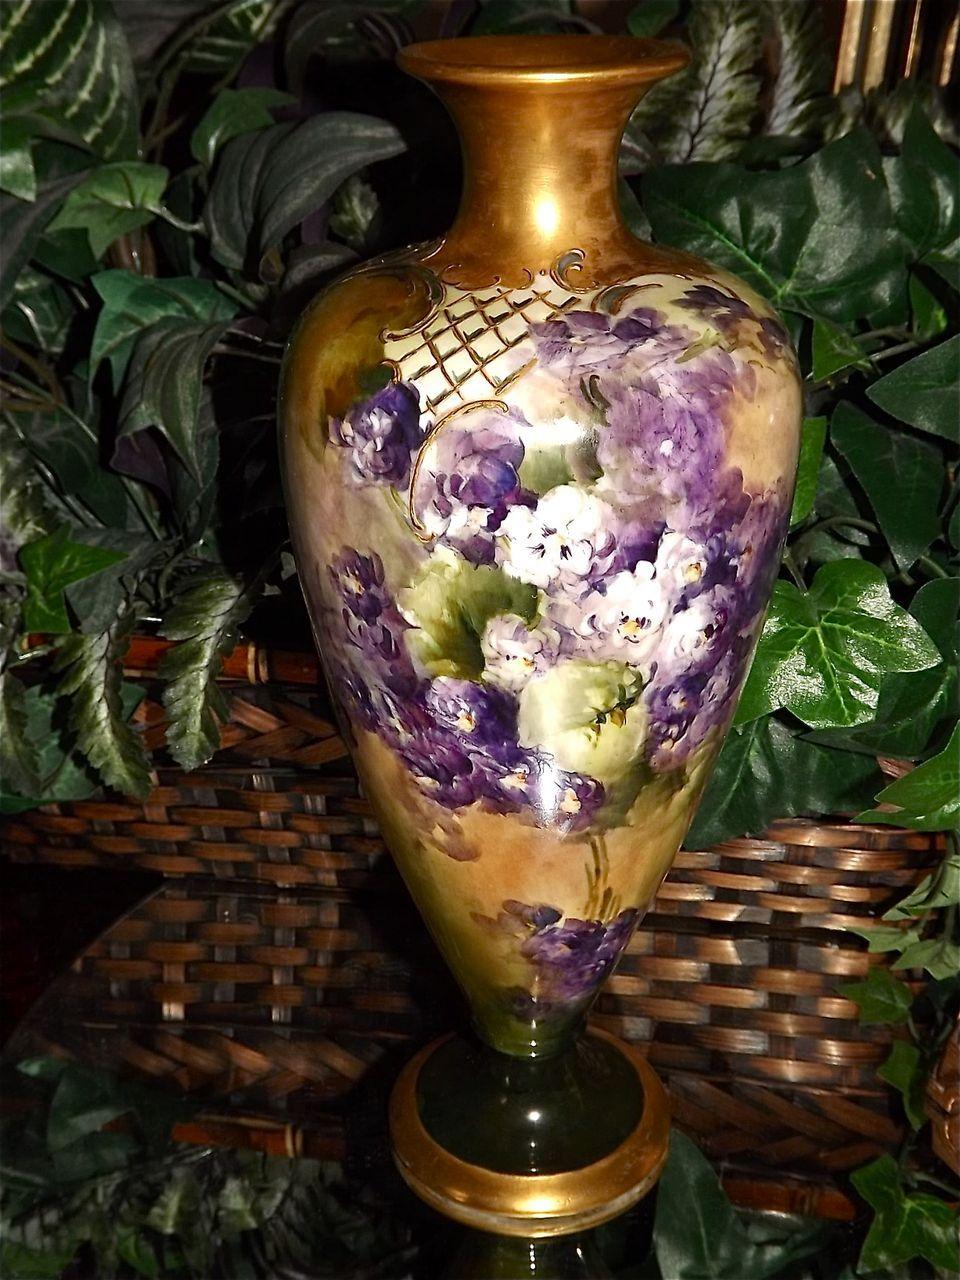 Cac ceramic art company belleek vase with hand painted purple cac ceramic art company belleek vase with hand painted purple and all things love lee ruby lane reviewsmspy